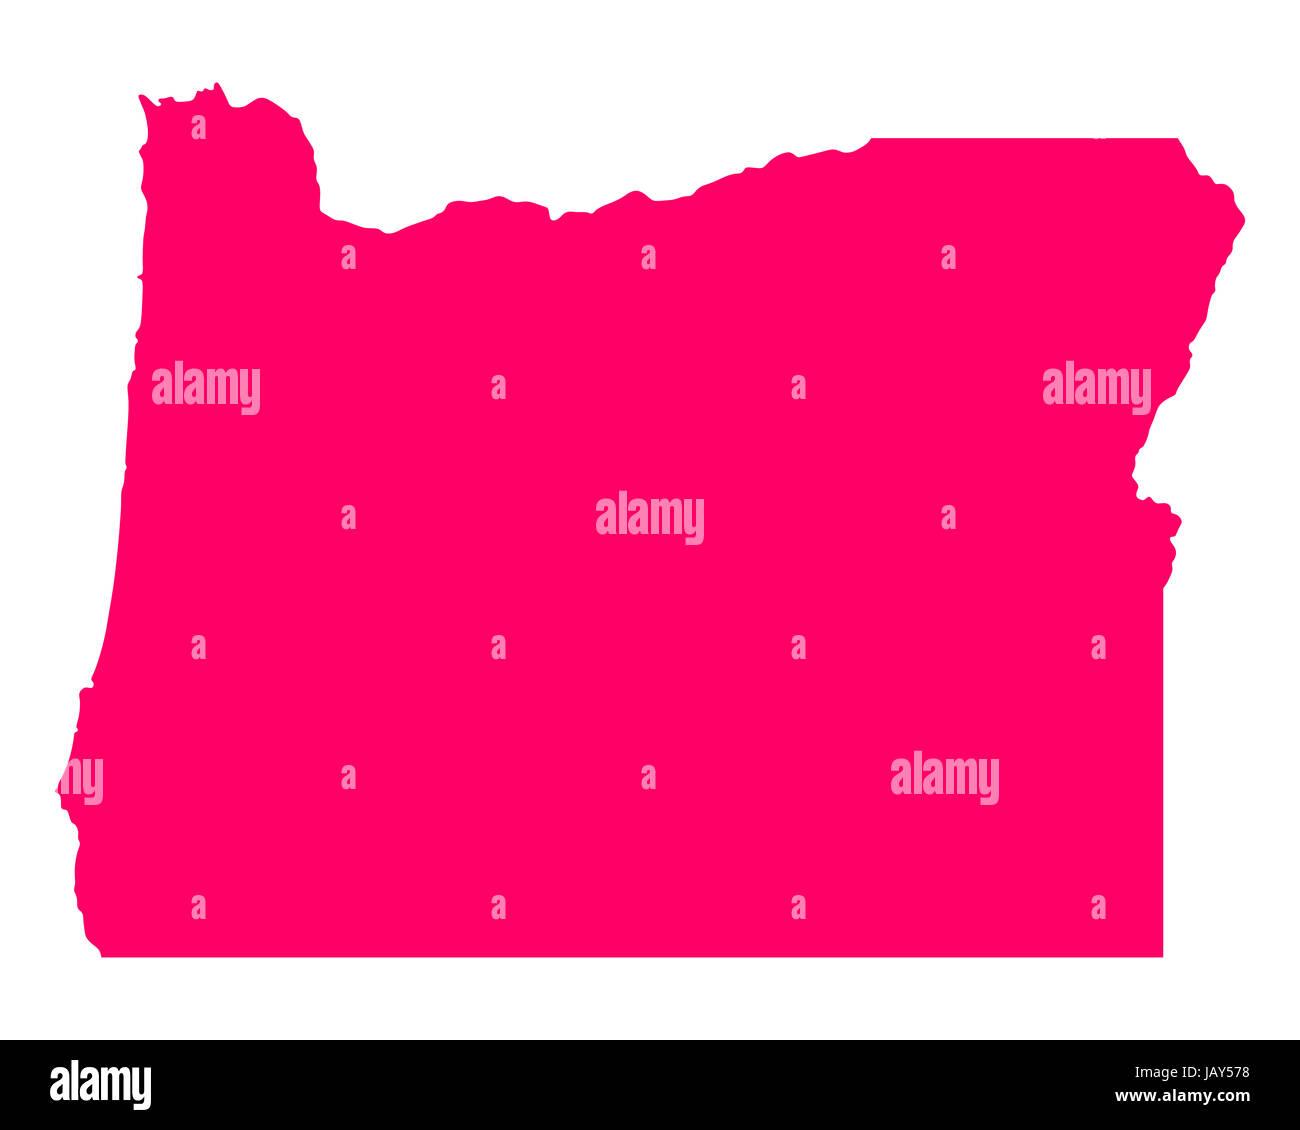 Karte von Oregon - Stock Image